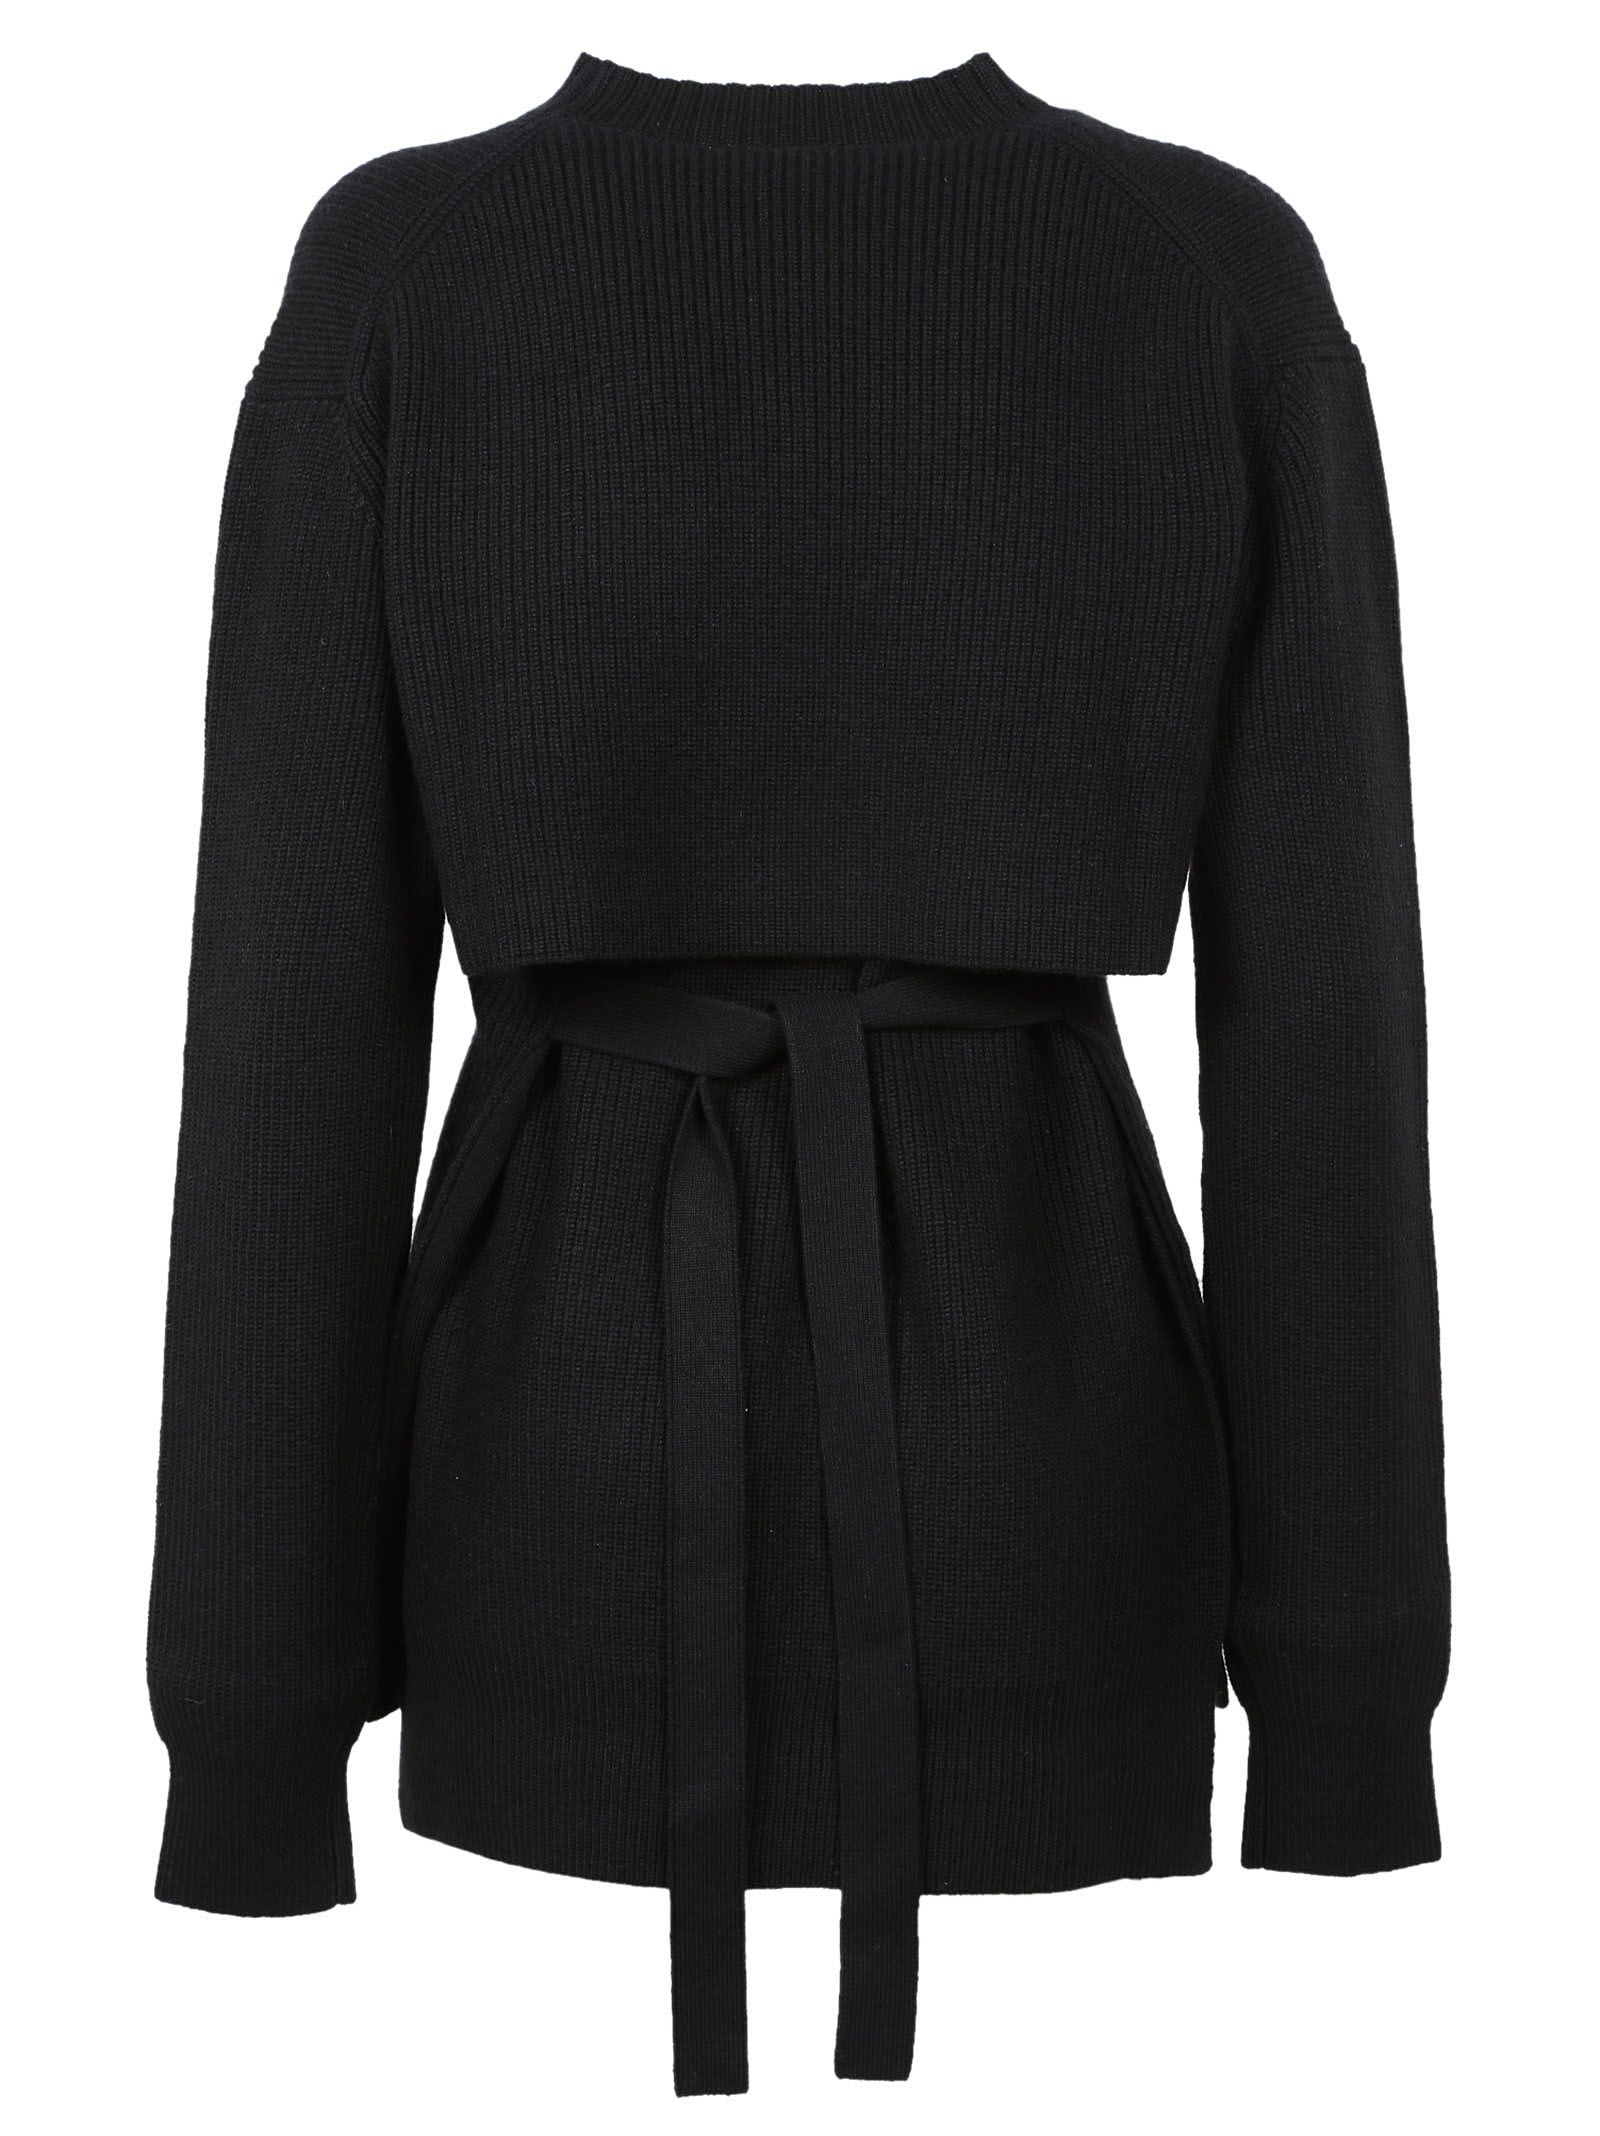 Proenza Schouler - Proenza Schouler Ribbed Sweater - Black ...